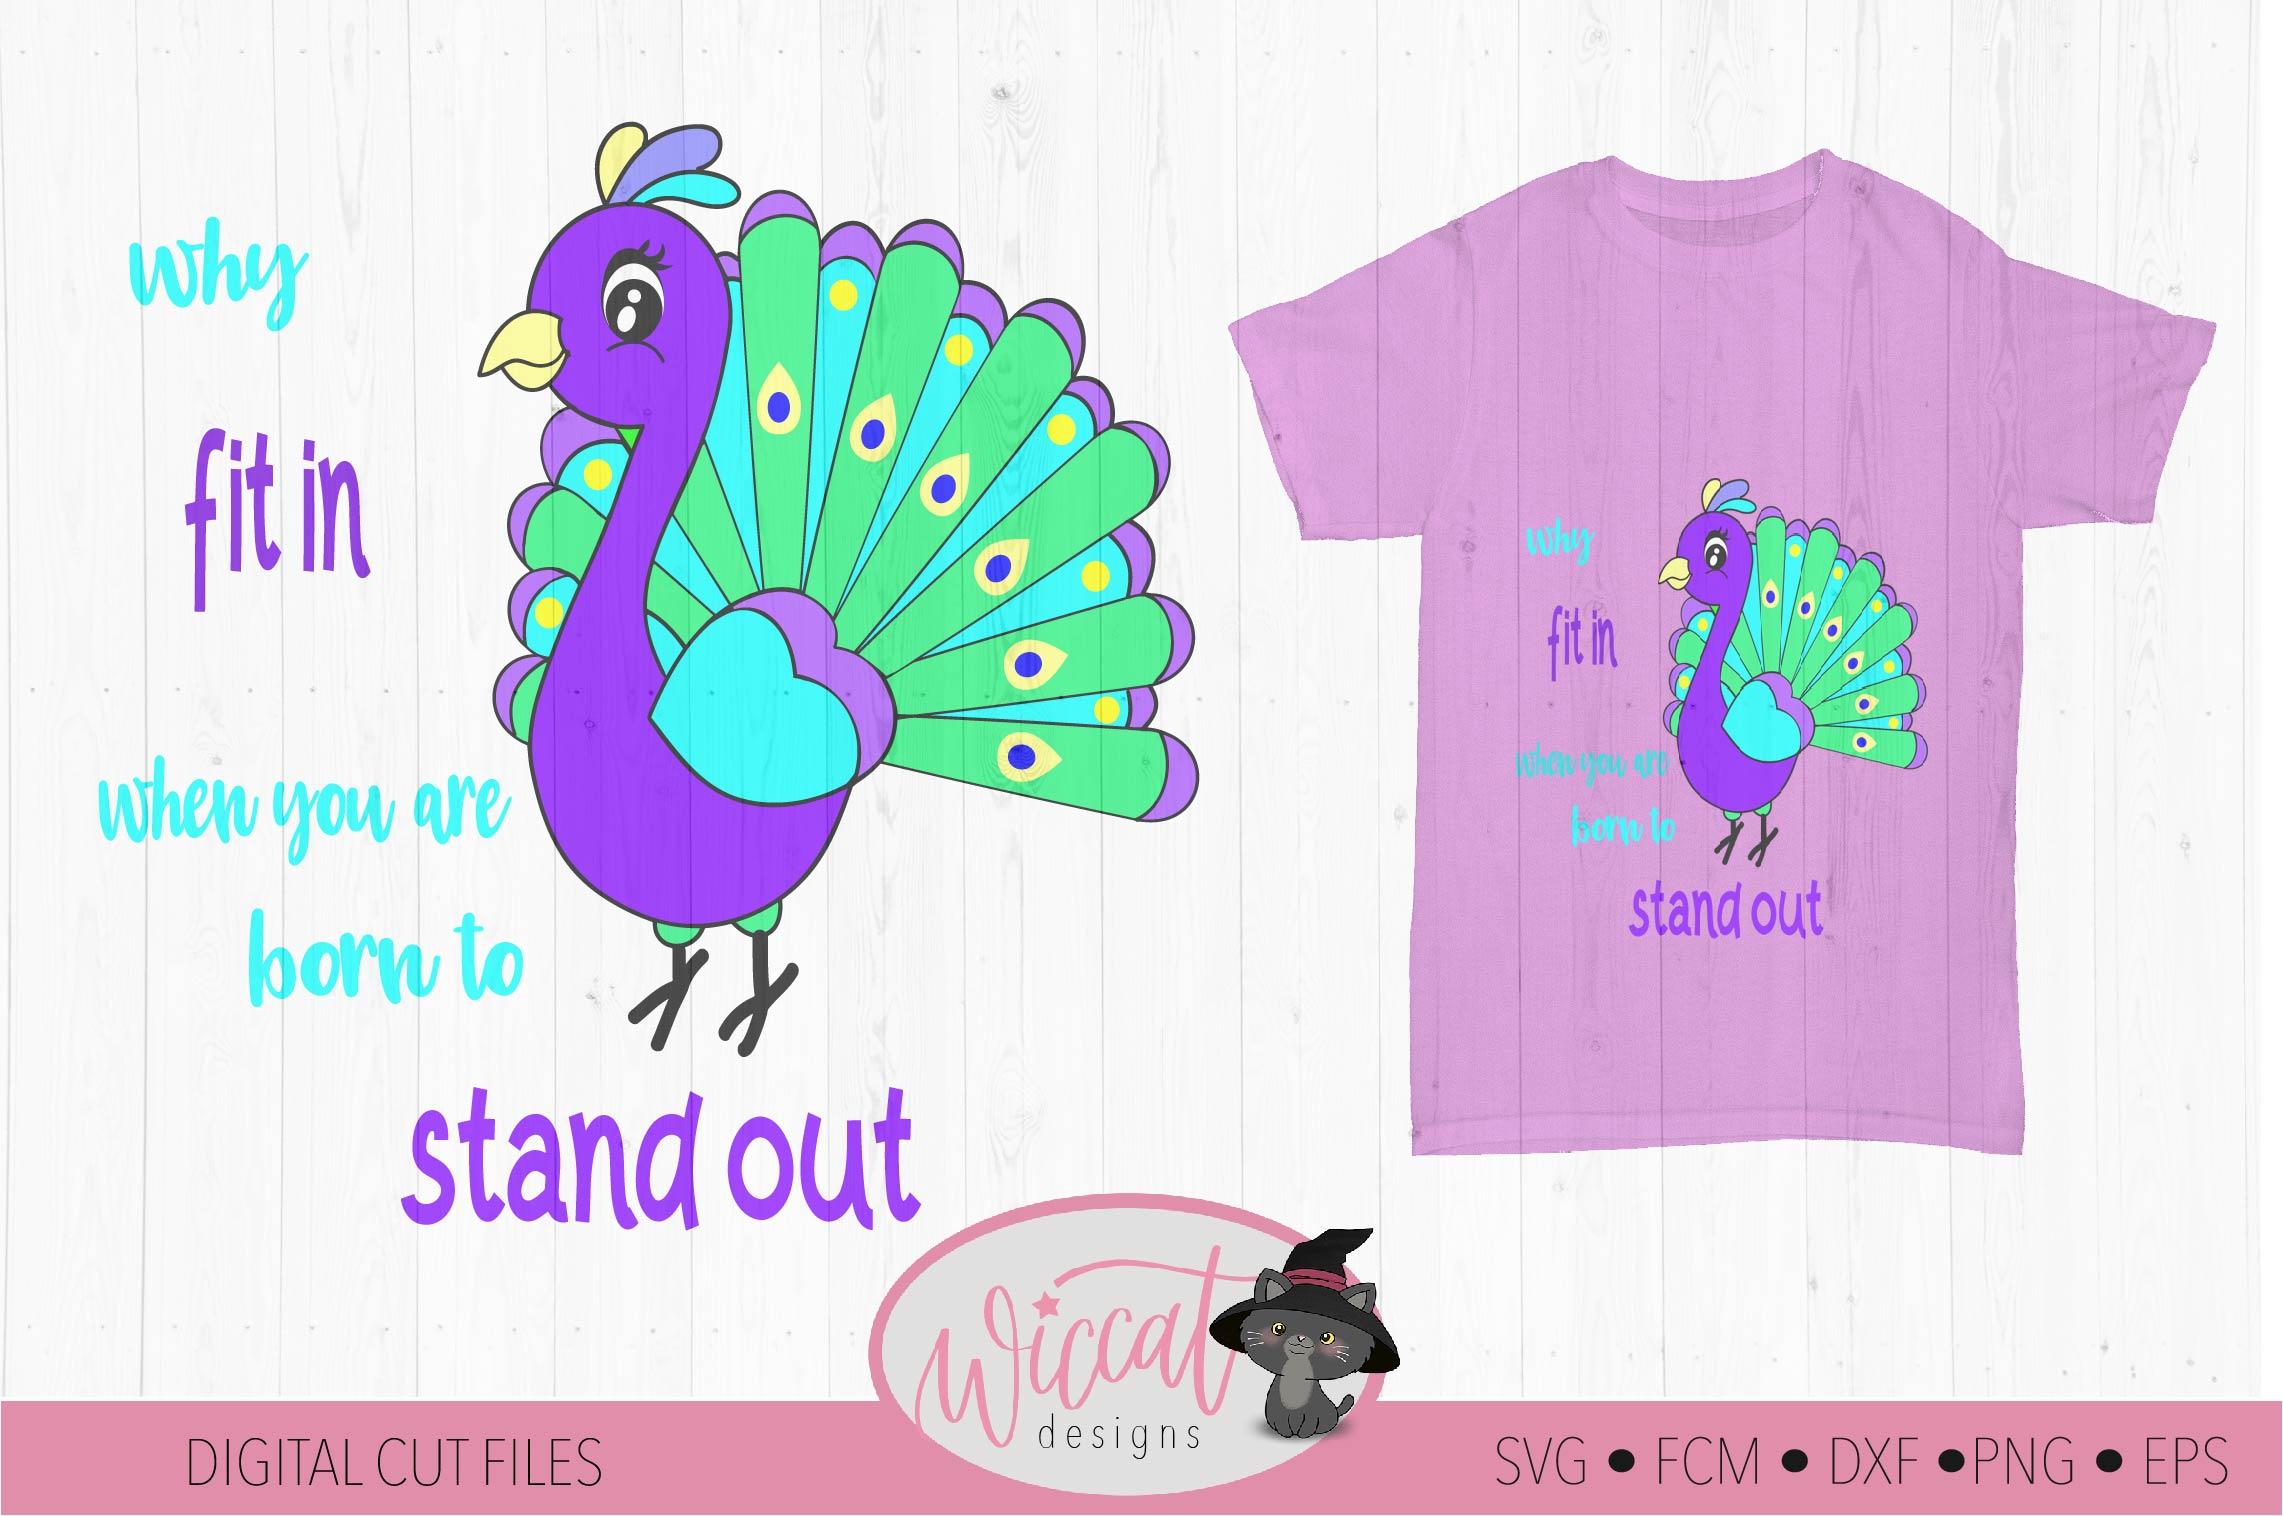 Peacock svg, bird svg, kids cut file example image 2